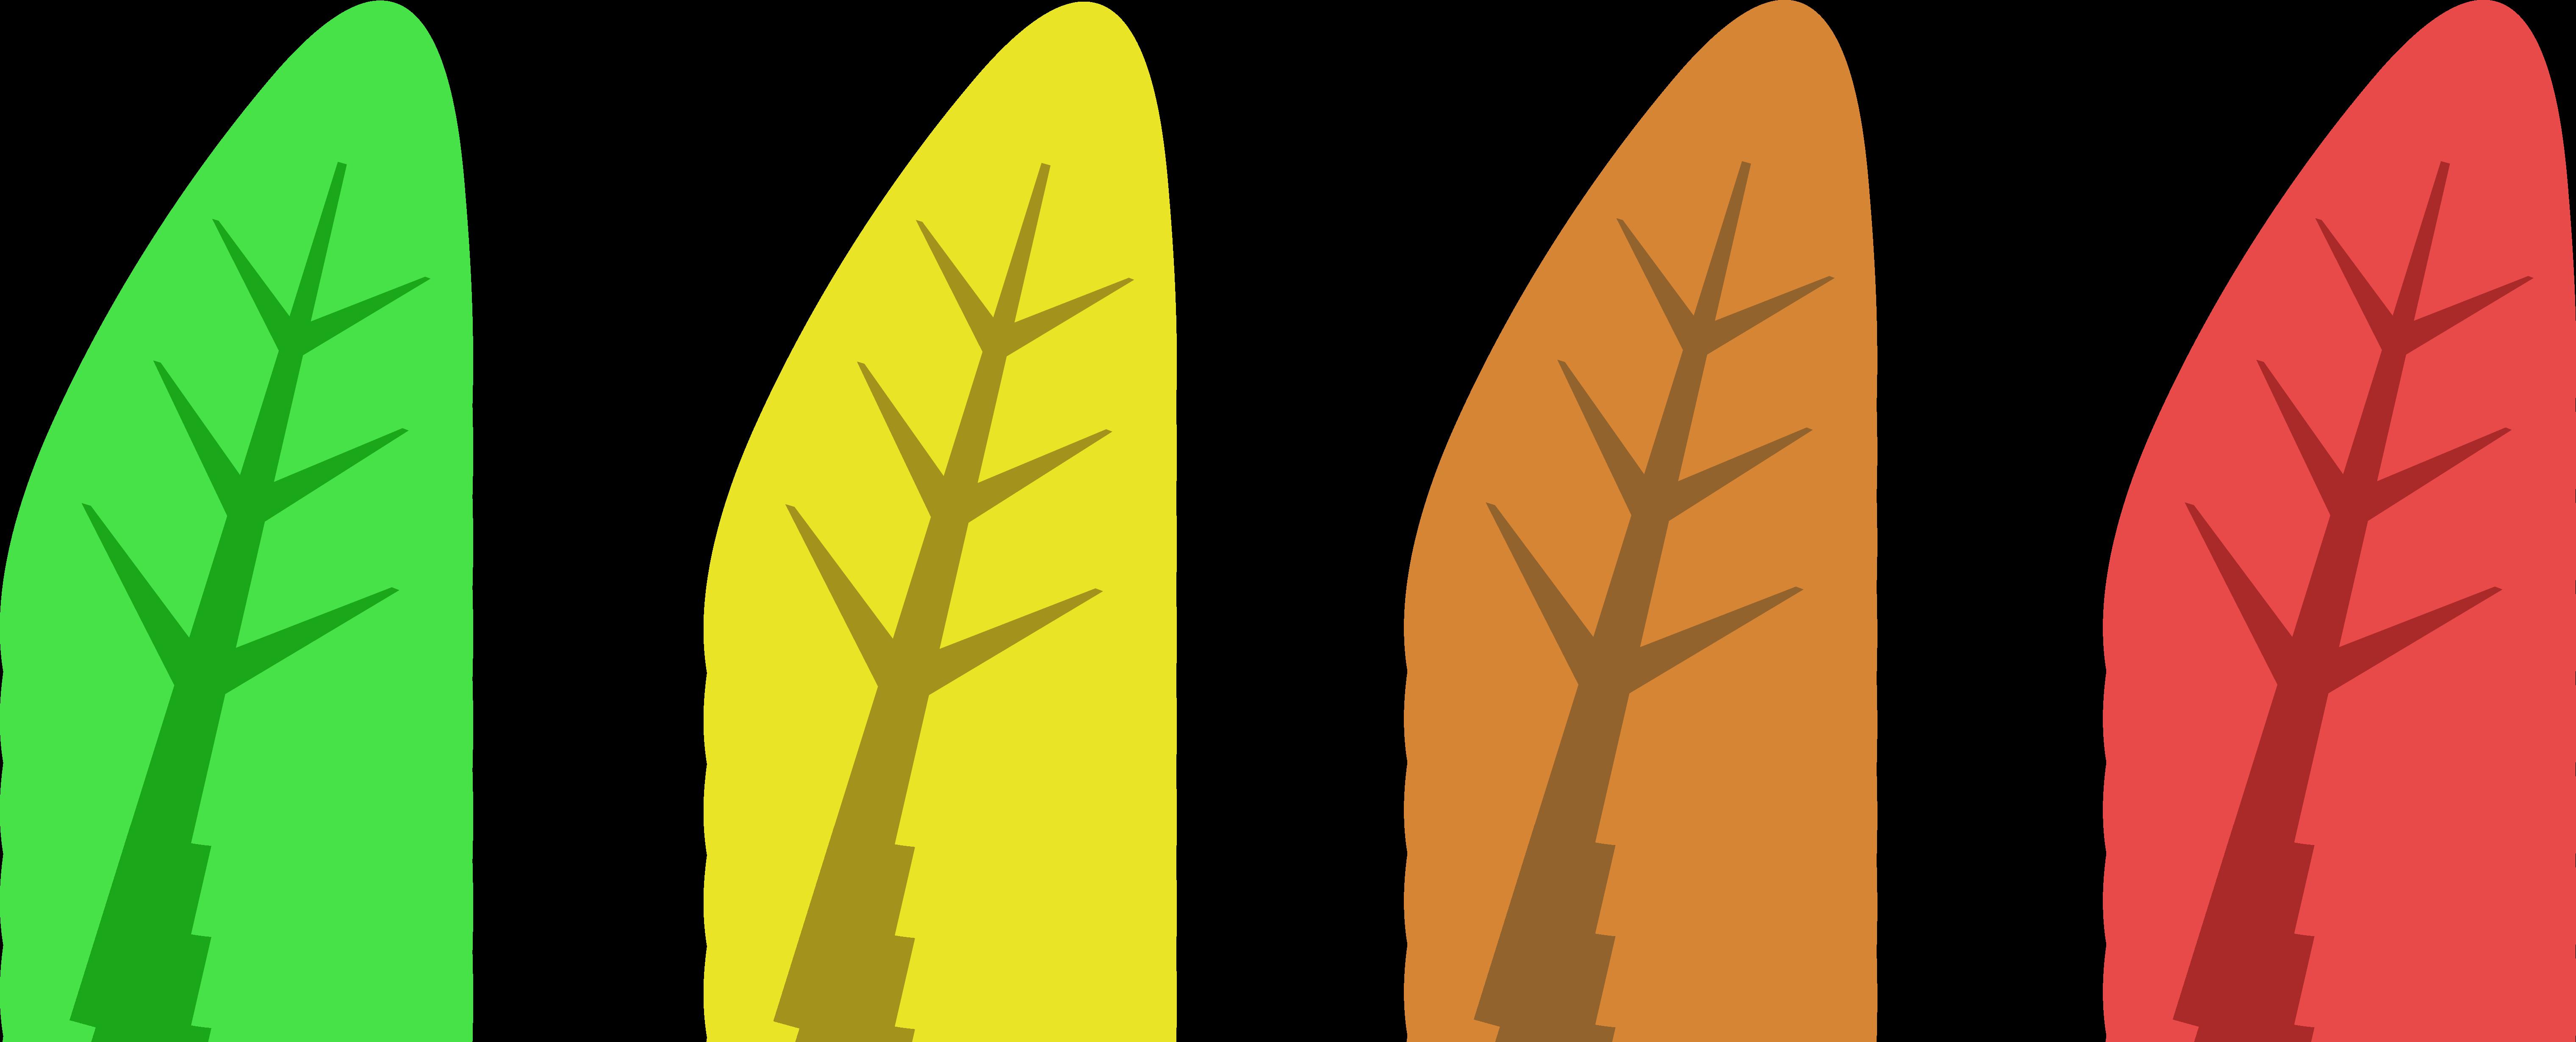 Leaf clipart Images leaf Clipartix graphics free